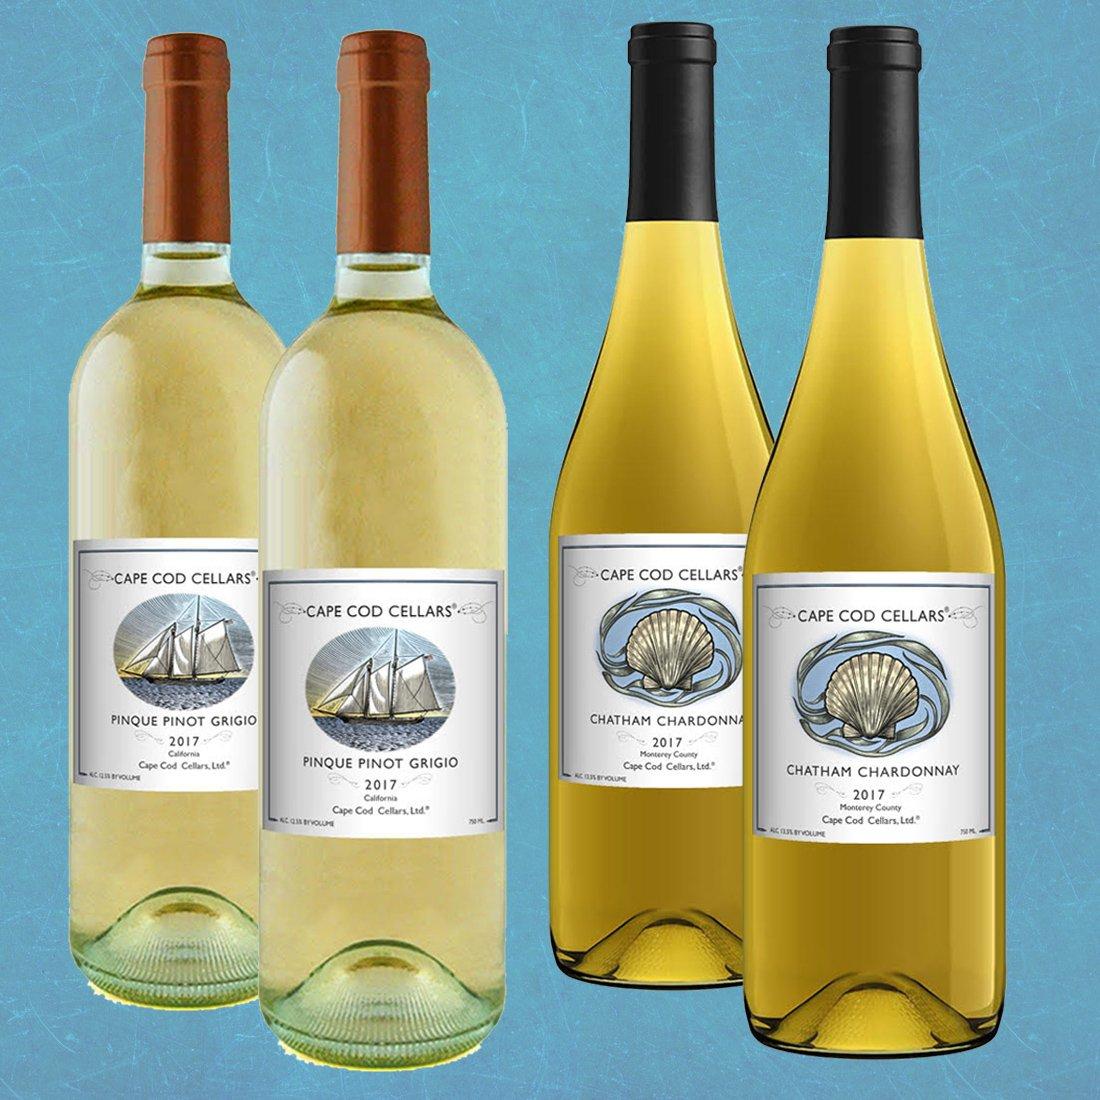 Case of white Cape Cod Cellars® Wines